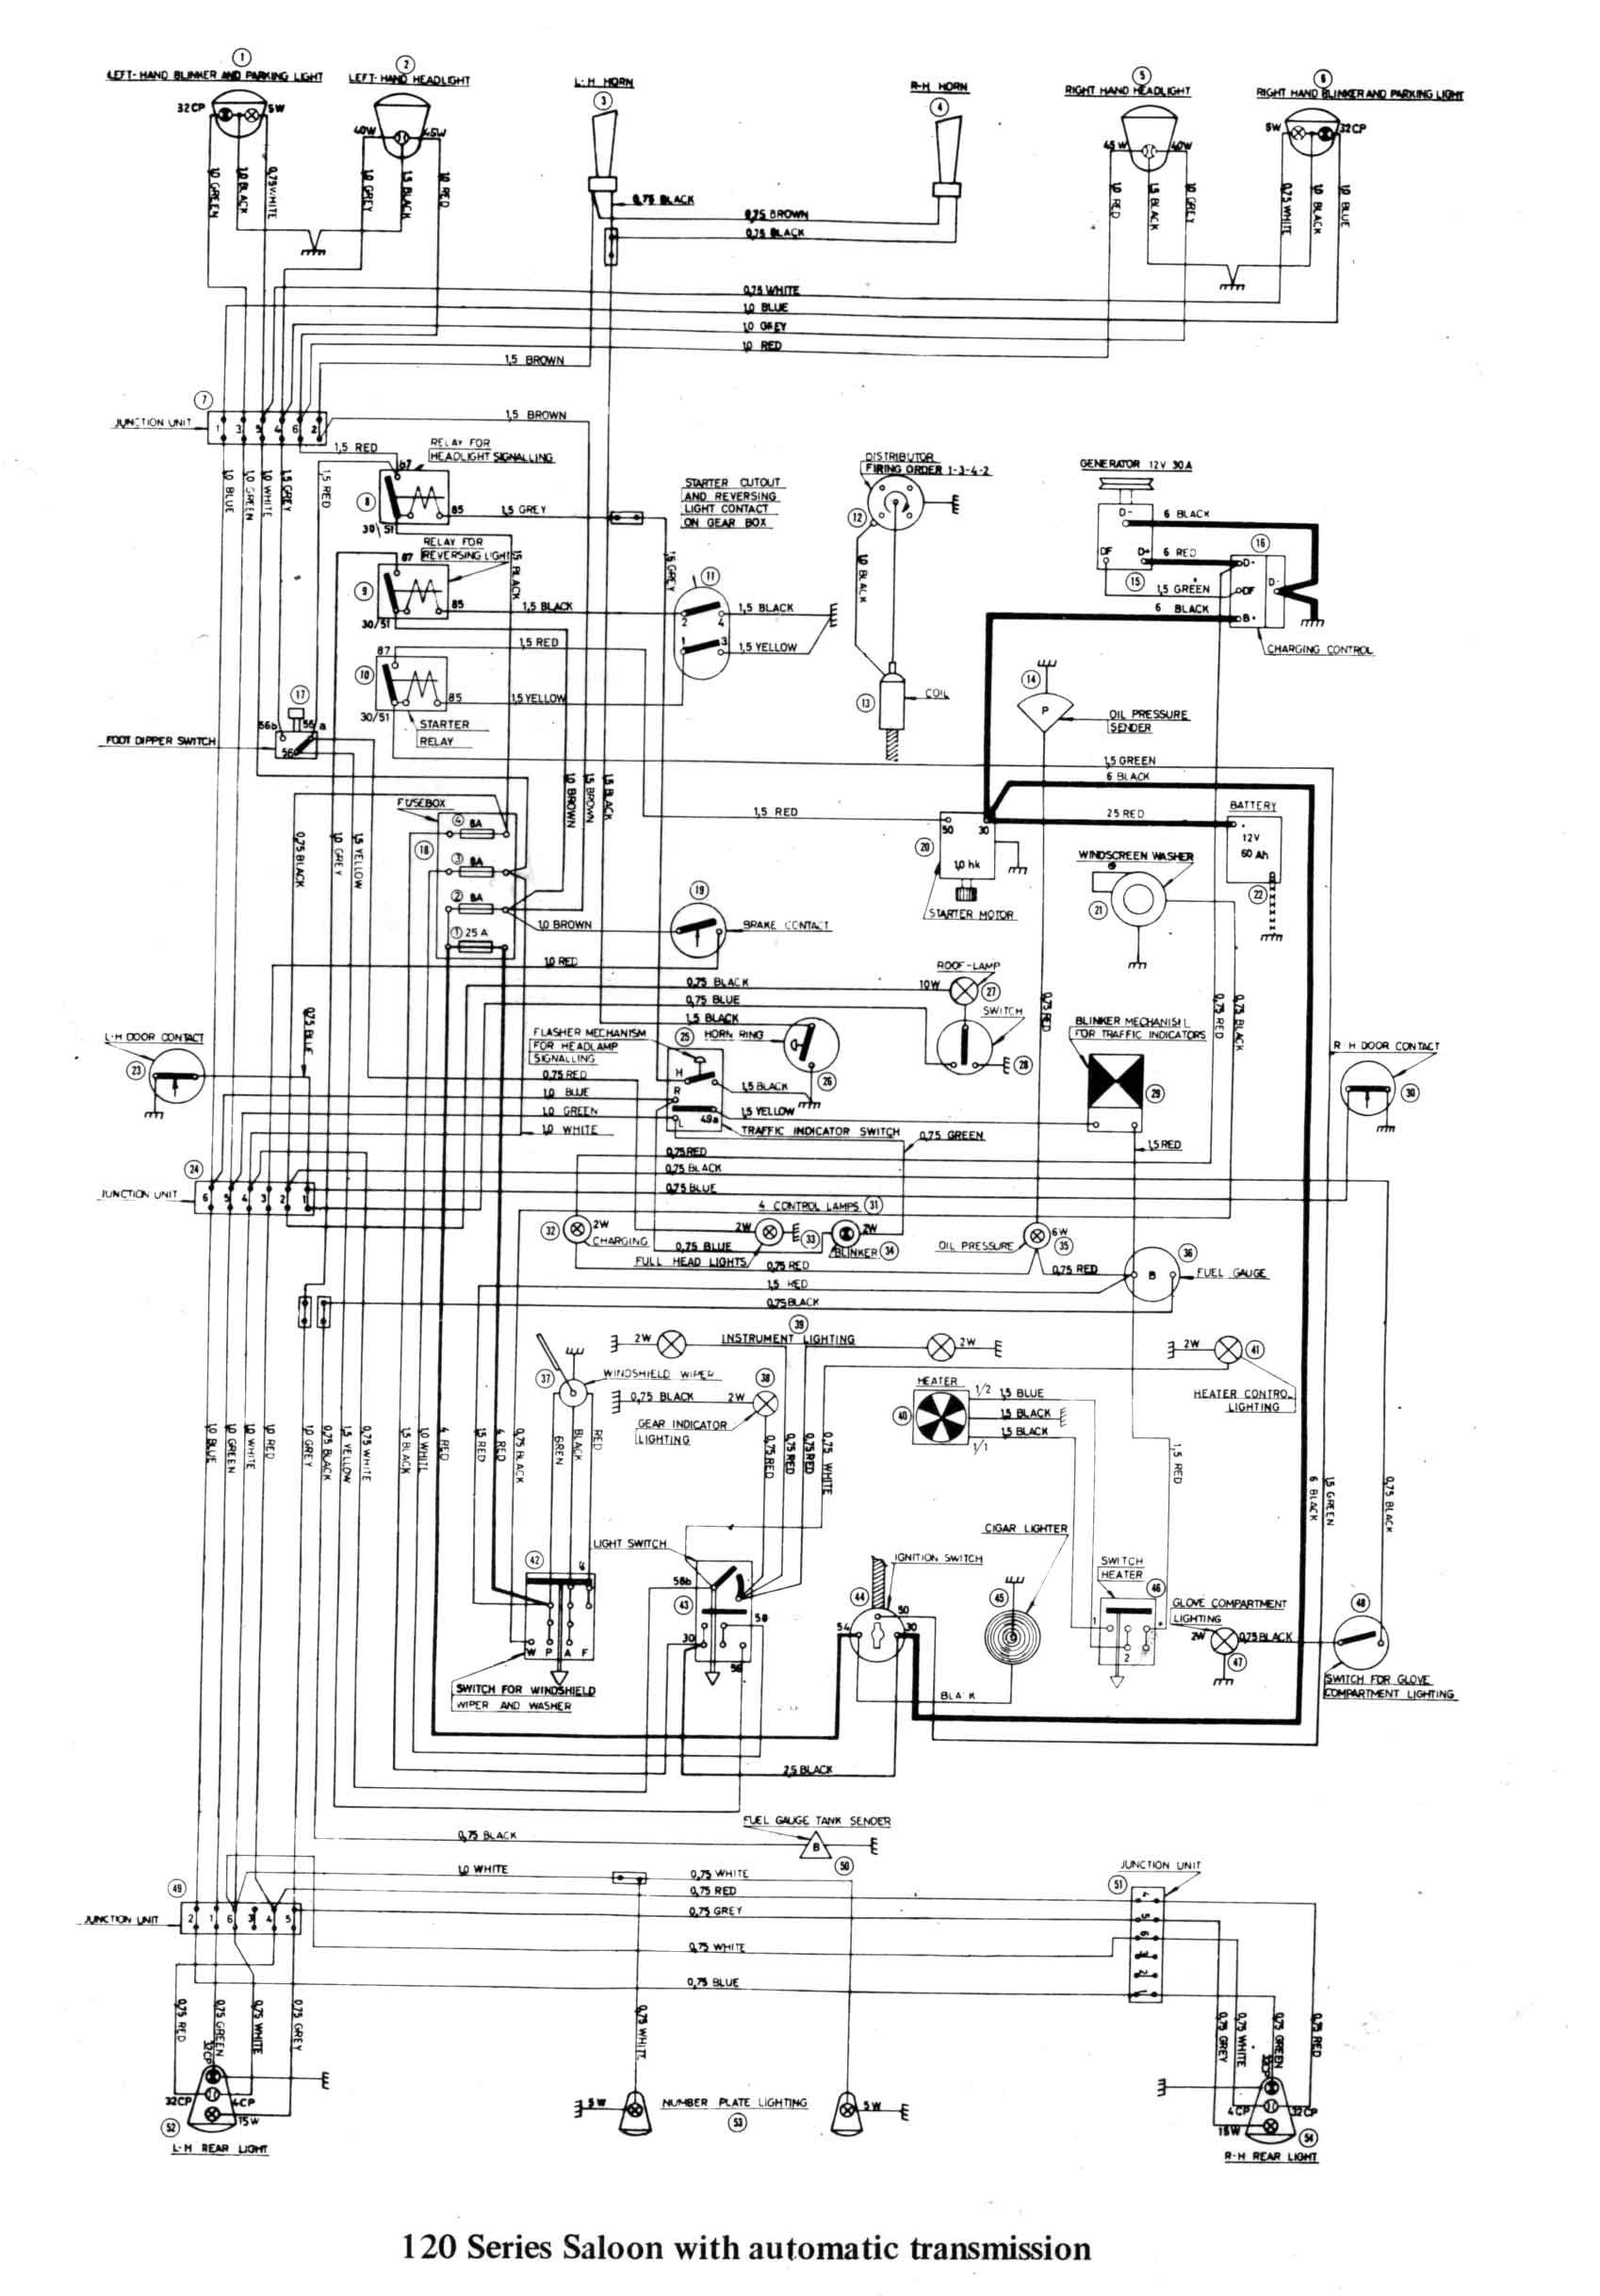 Wiring Diagram For Autopage Alarm Inspirationa Sw Em Od Retrofitting Vintage Volvo Refer Wiring Diagram 122s Showy